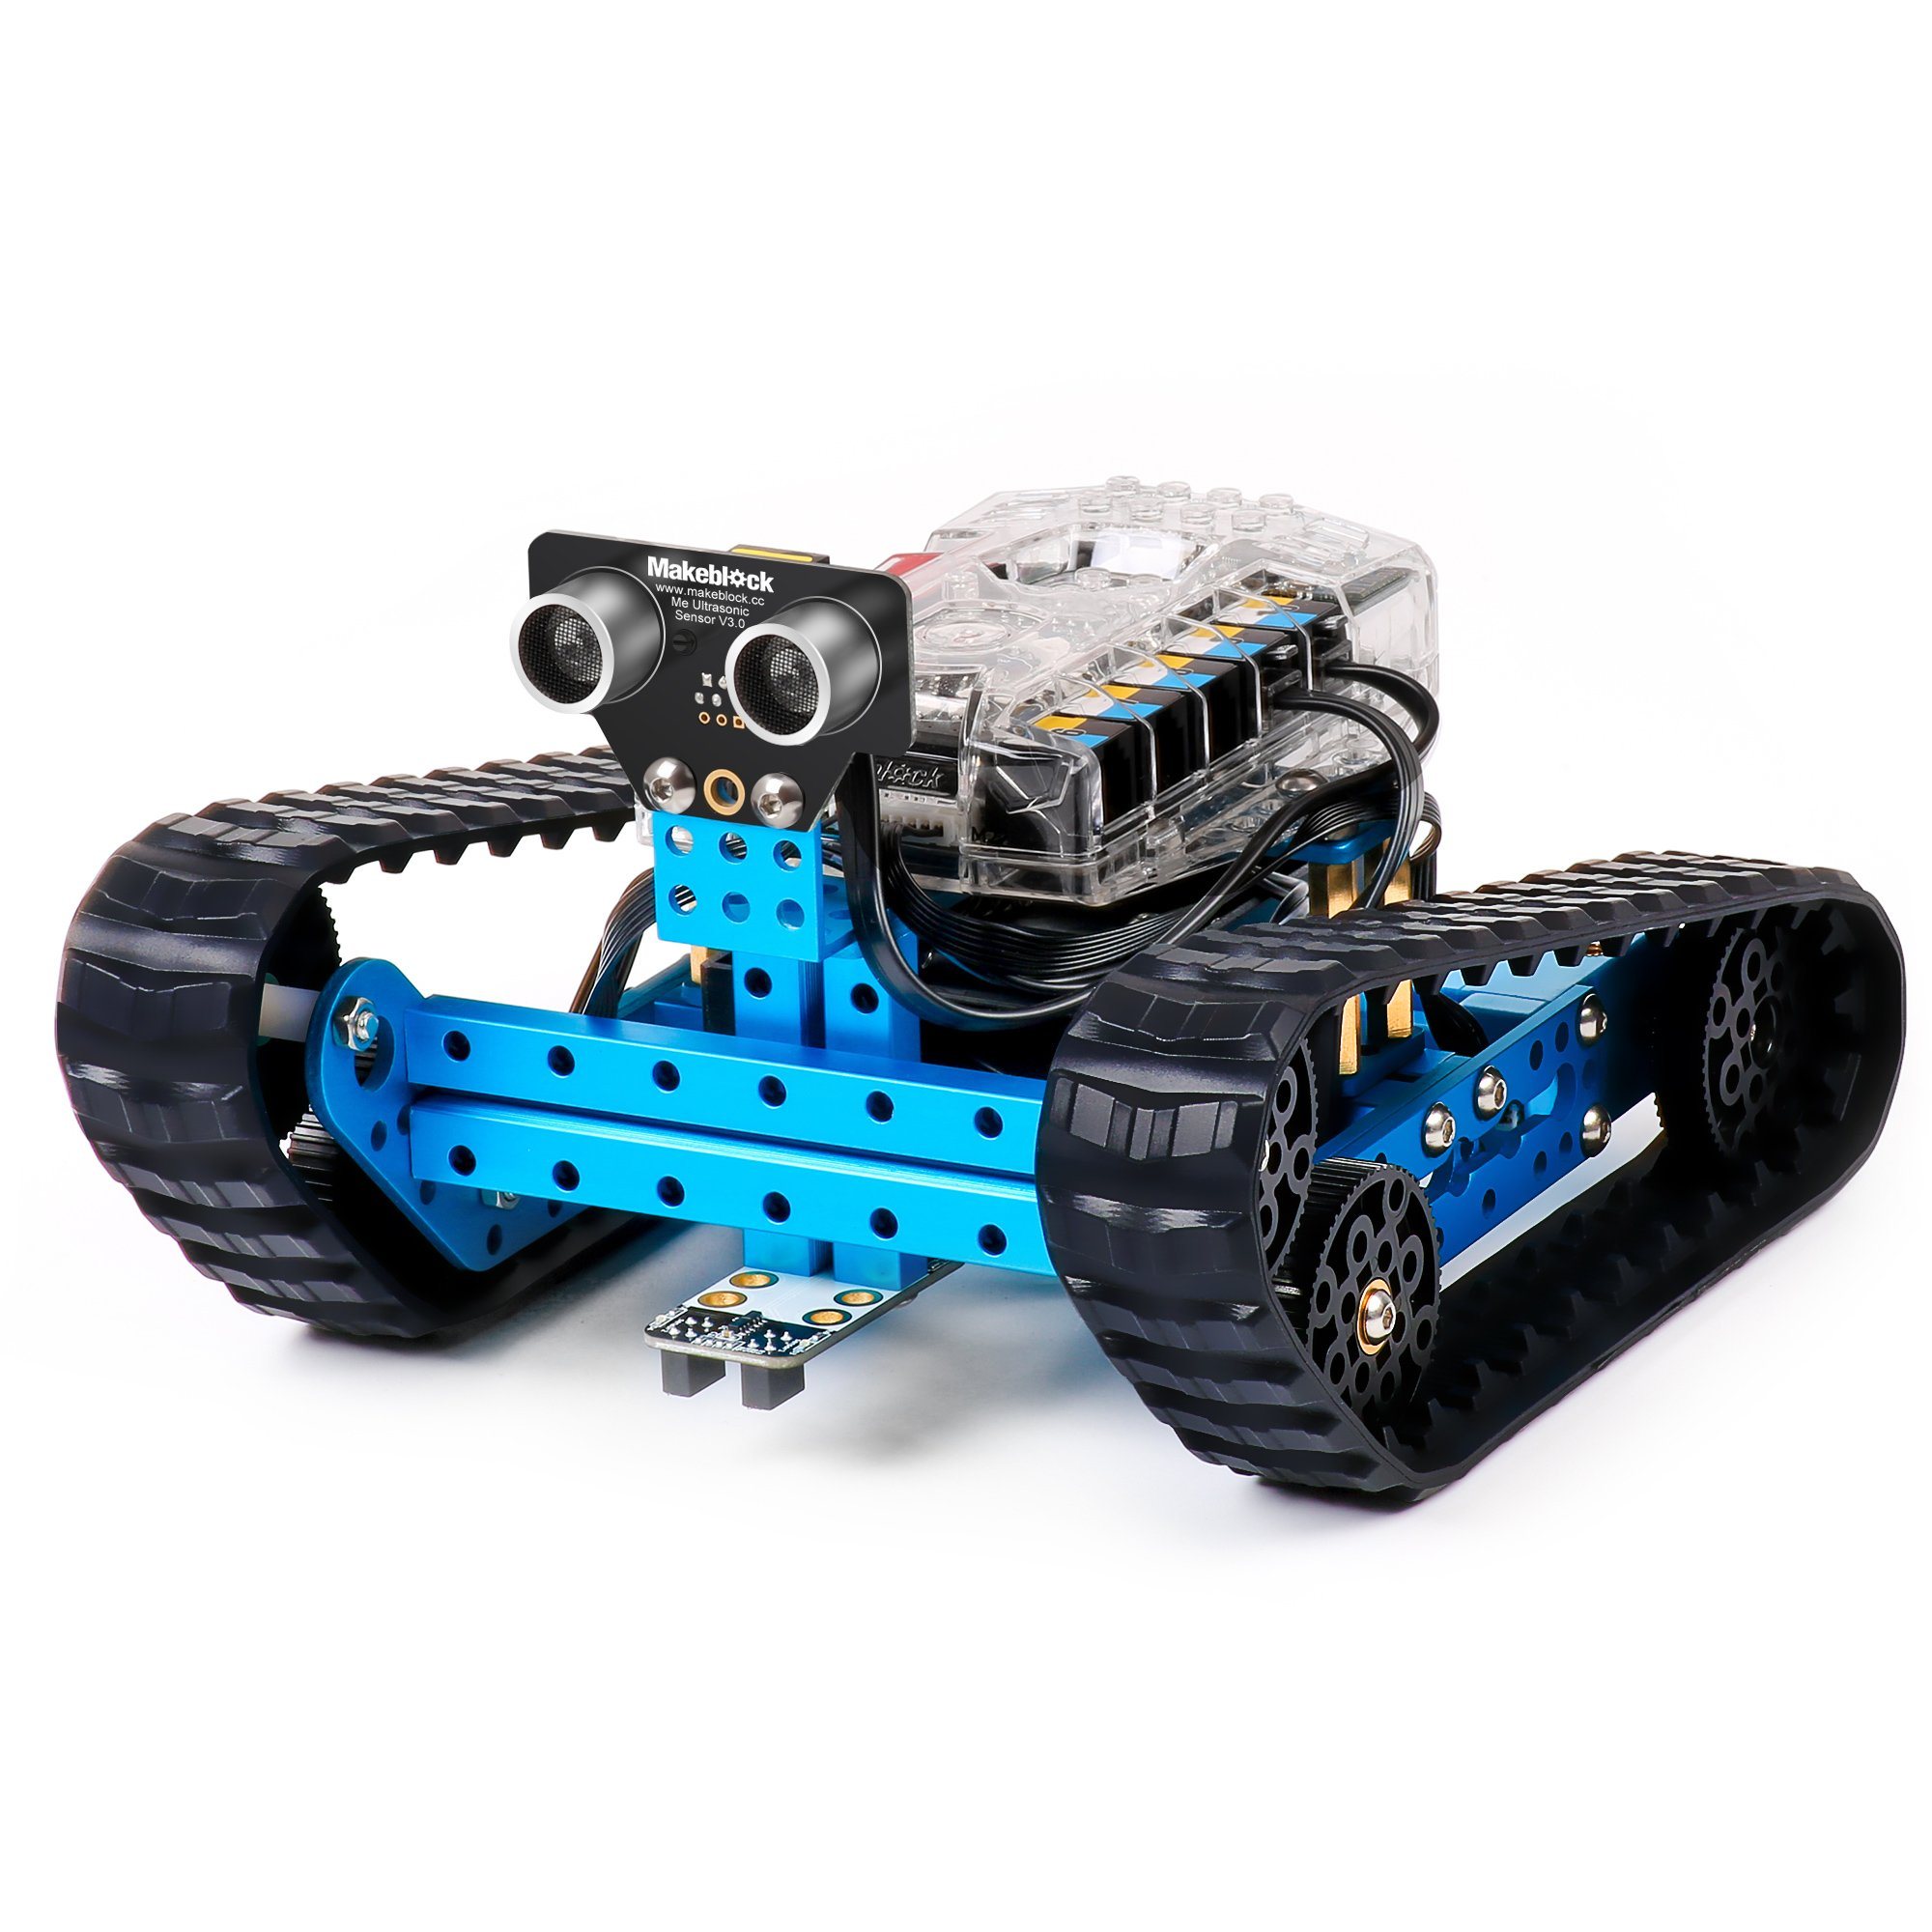 Makeblock Programmable mBot Ranger Robot Kit, STEM Educational Engineering Design & Build 3 in 1 Programmable Robotic System Kit - Ages 10+ by Makeblock (Image #1)